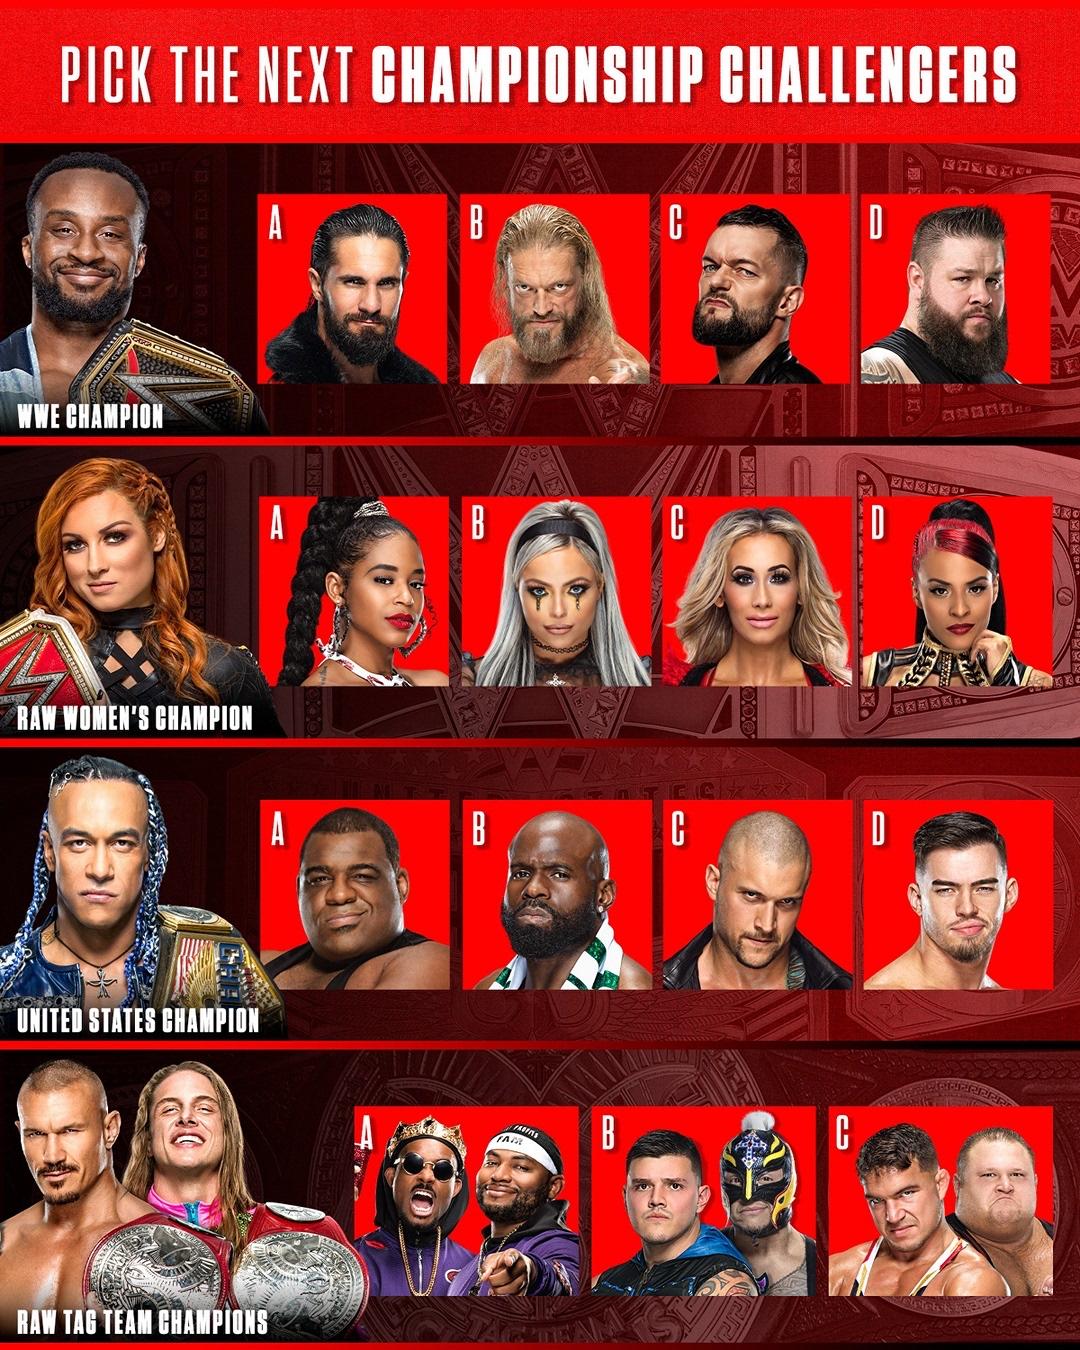 WWE Raw Preview (25/10/21): New Era Begins; Title Match Set 25